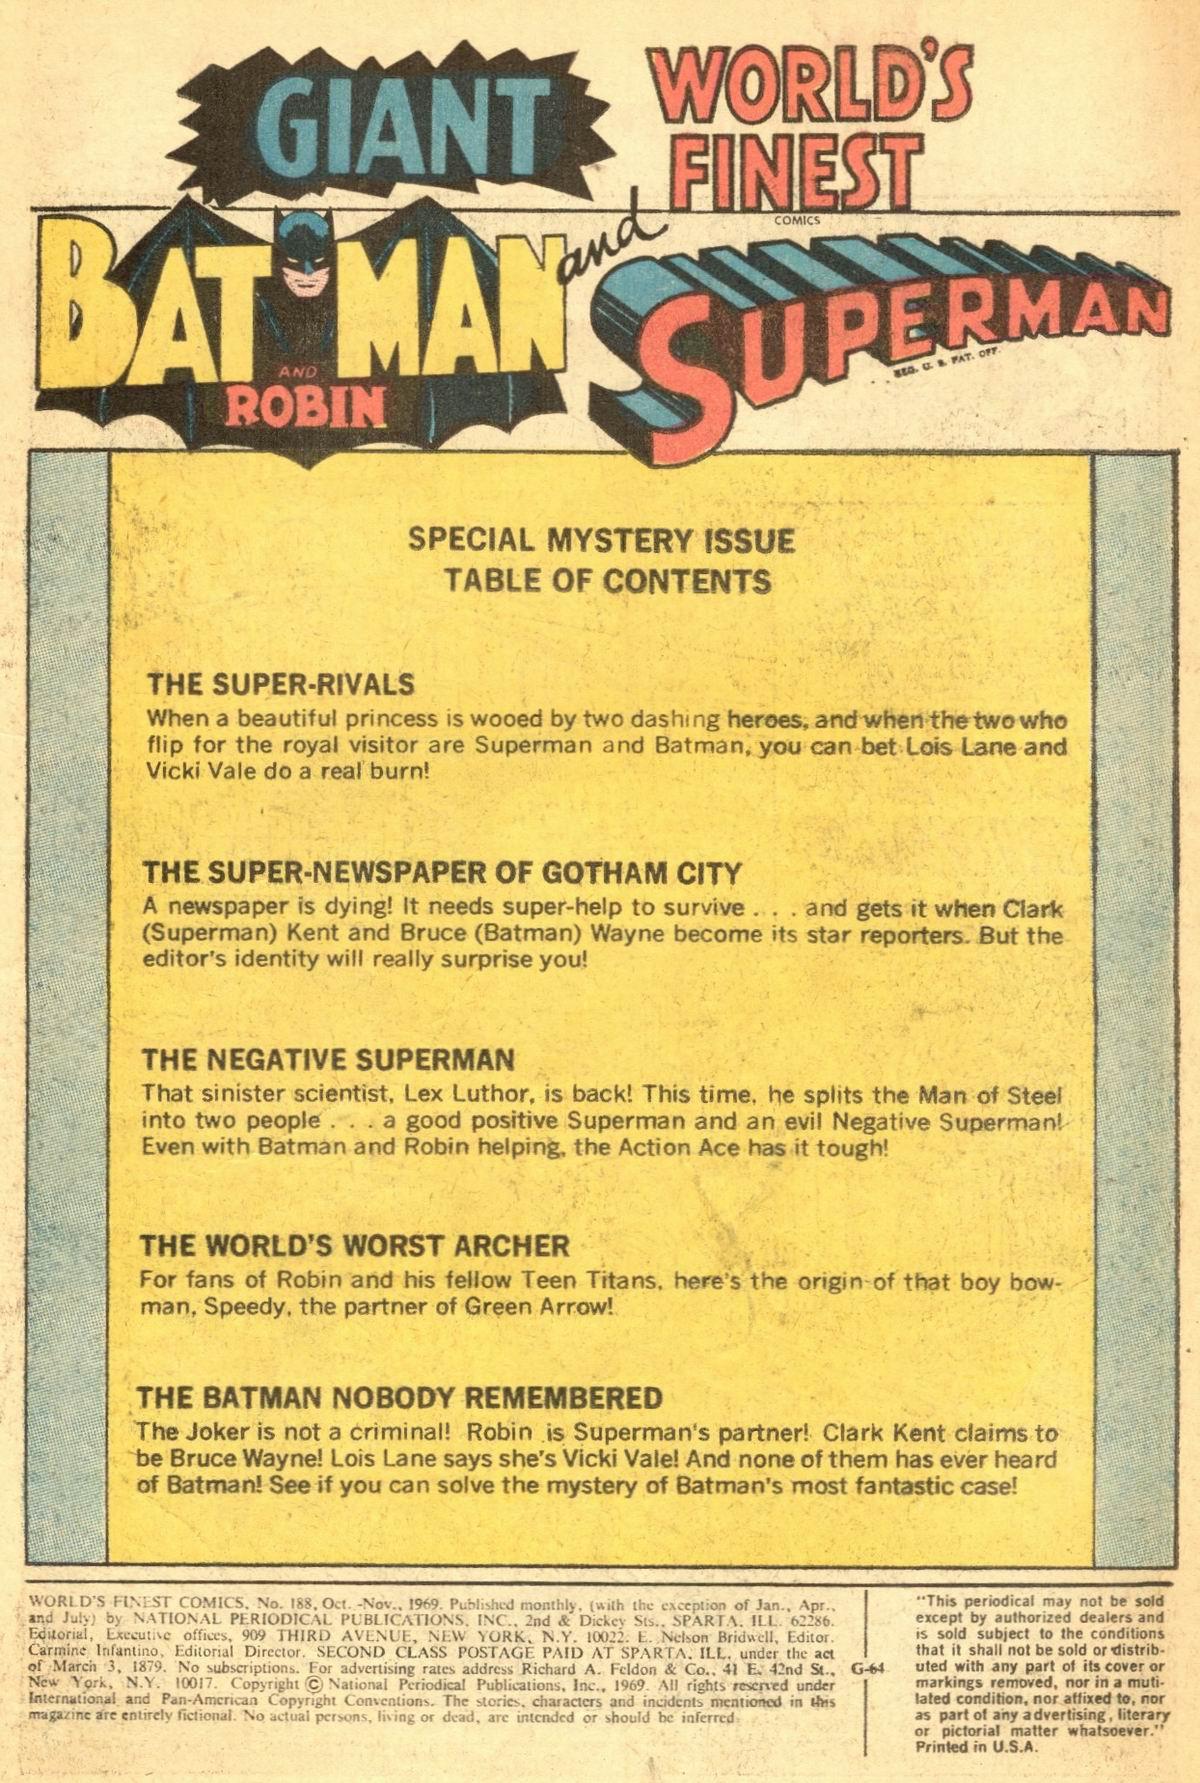 Read online World's Finest Comics comic -  Issue #188 - 3